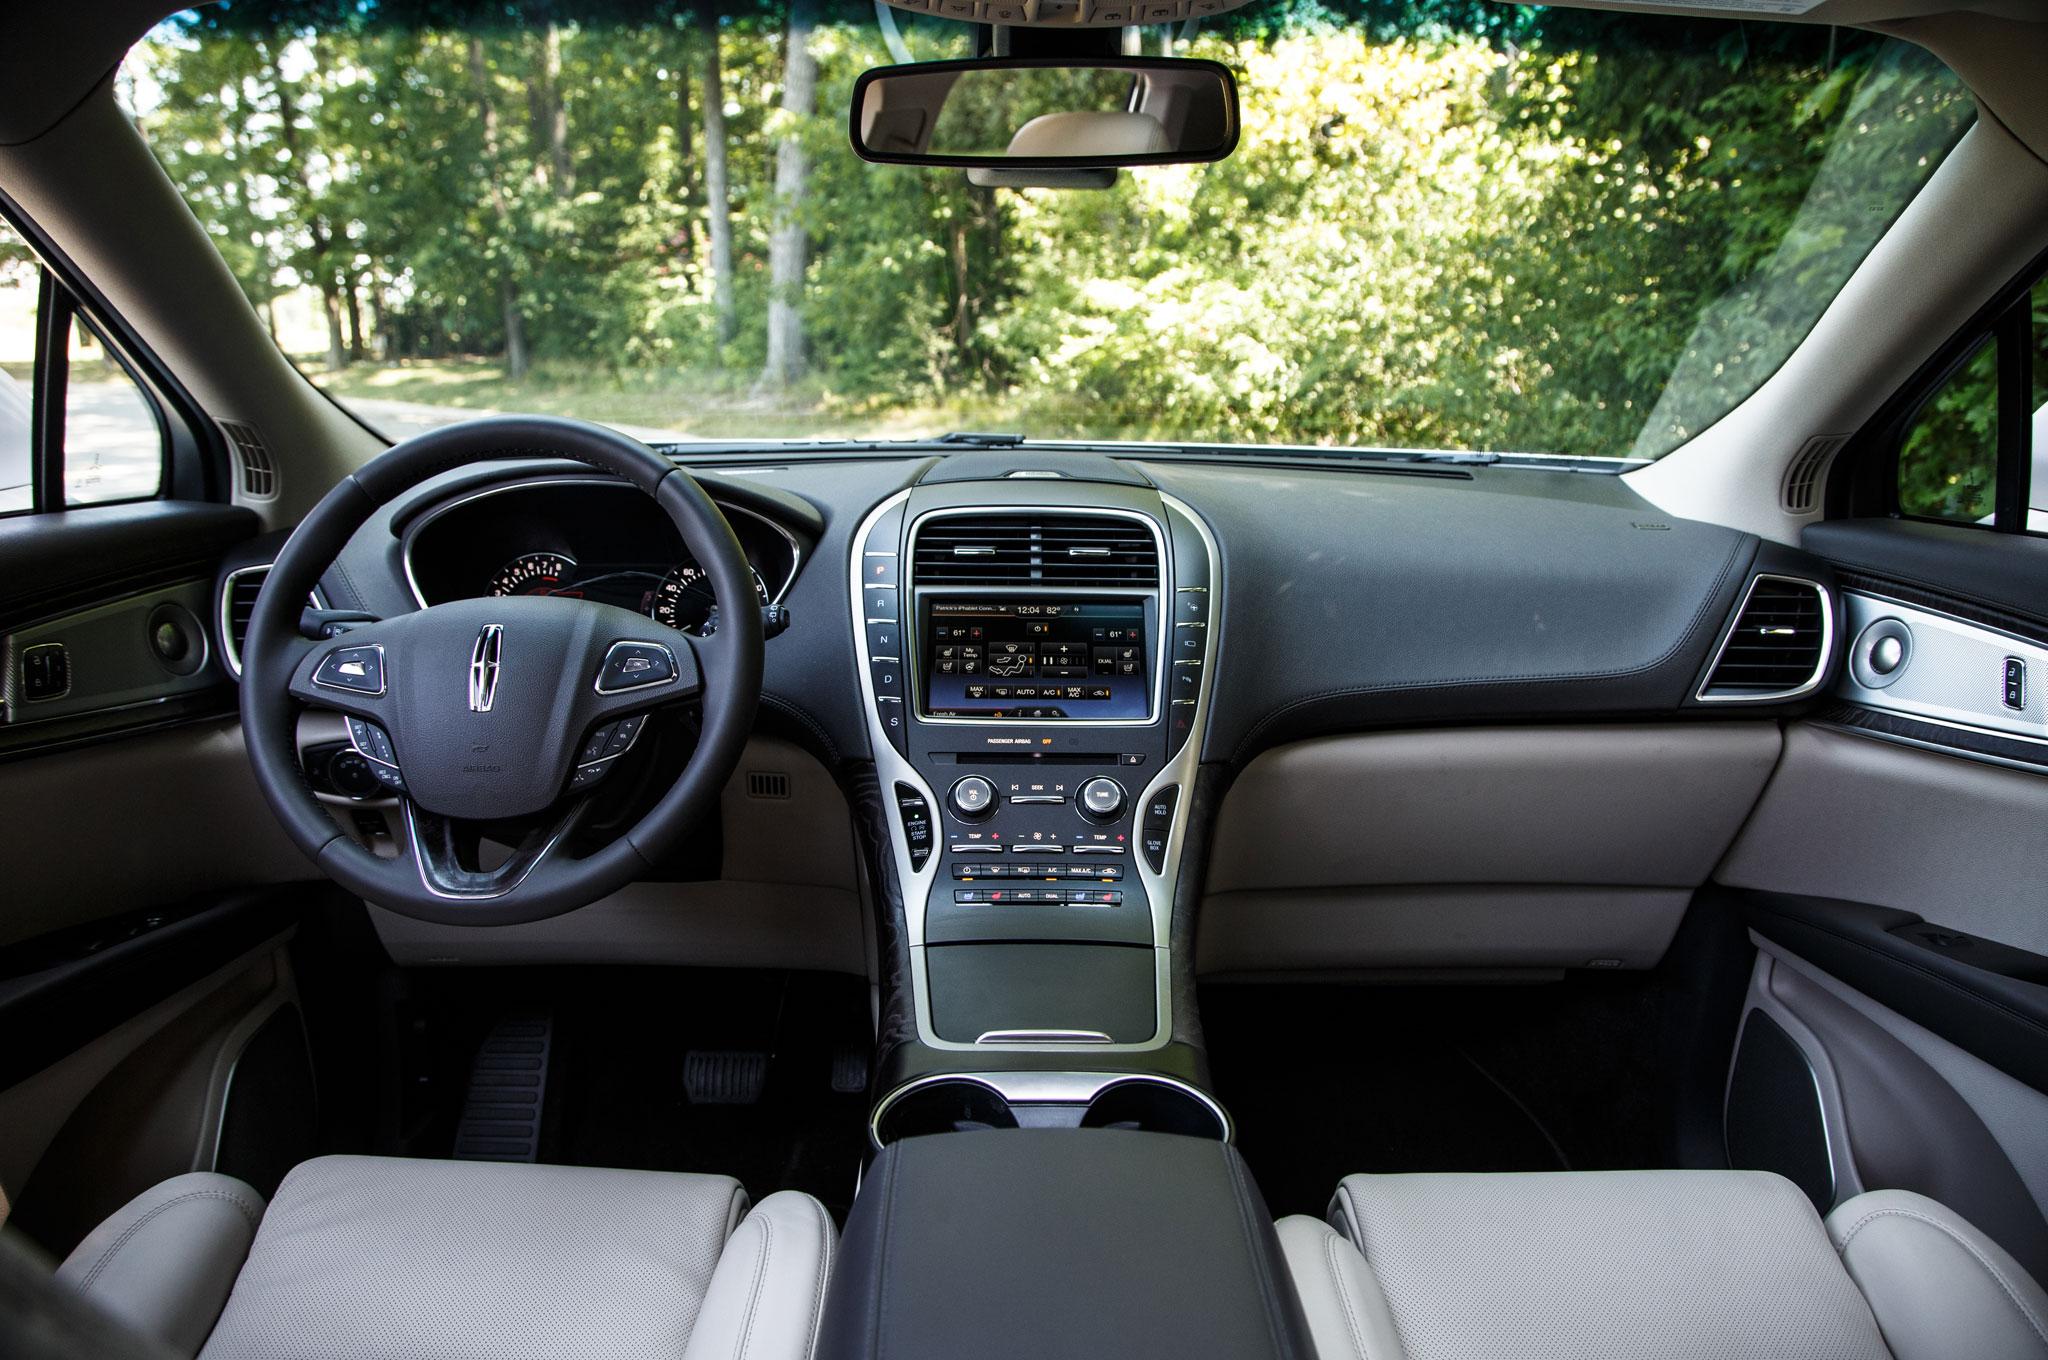 http://st.automobilemag.com/uploads/sites/11/2015/08/2016-Lincoln-MKX-cabin-02.jpg